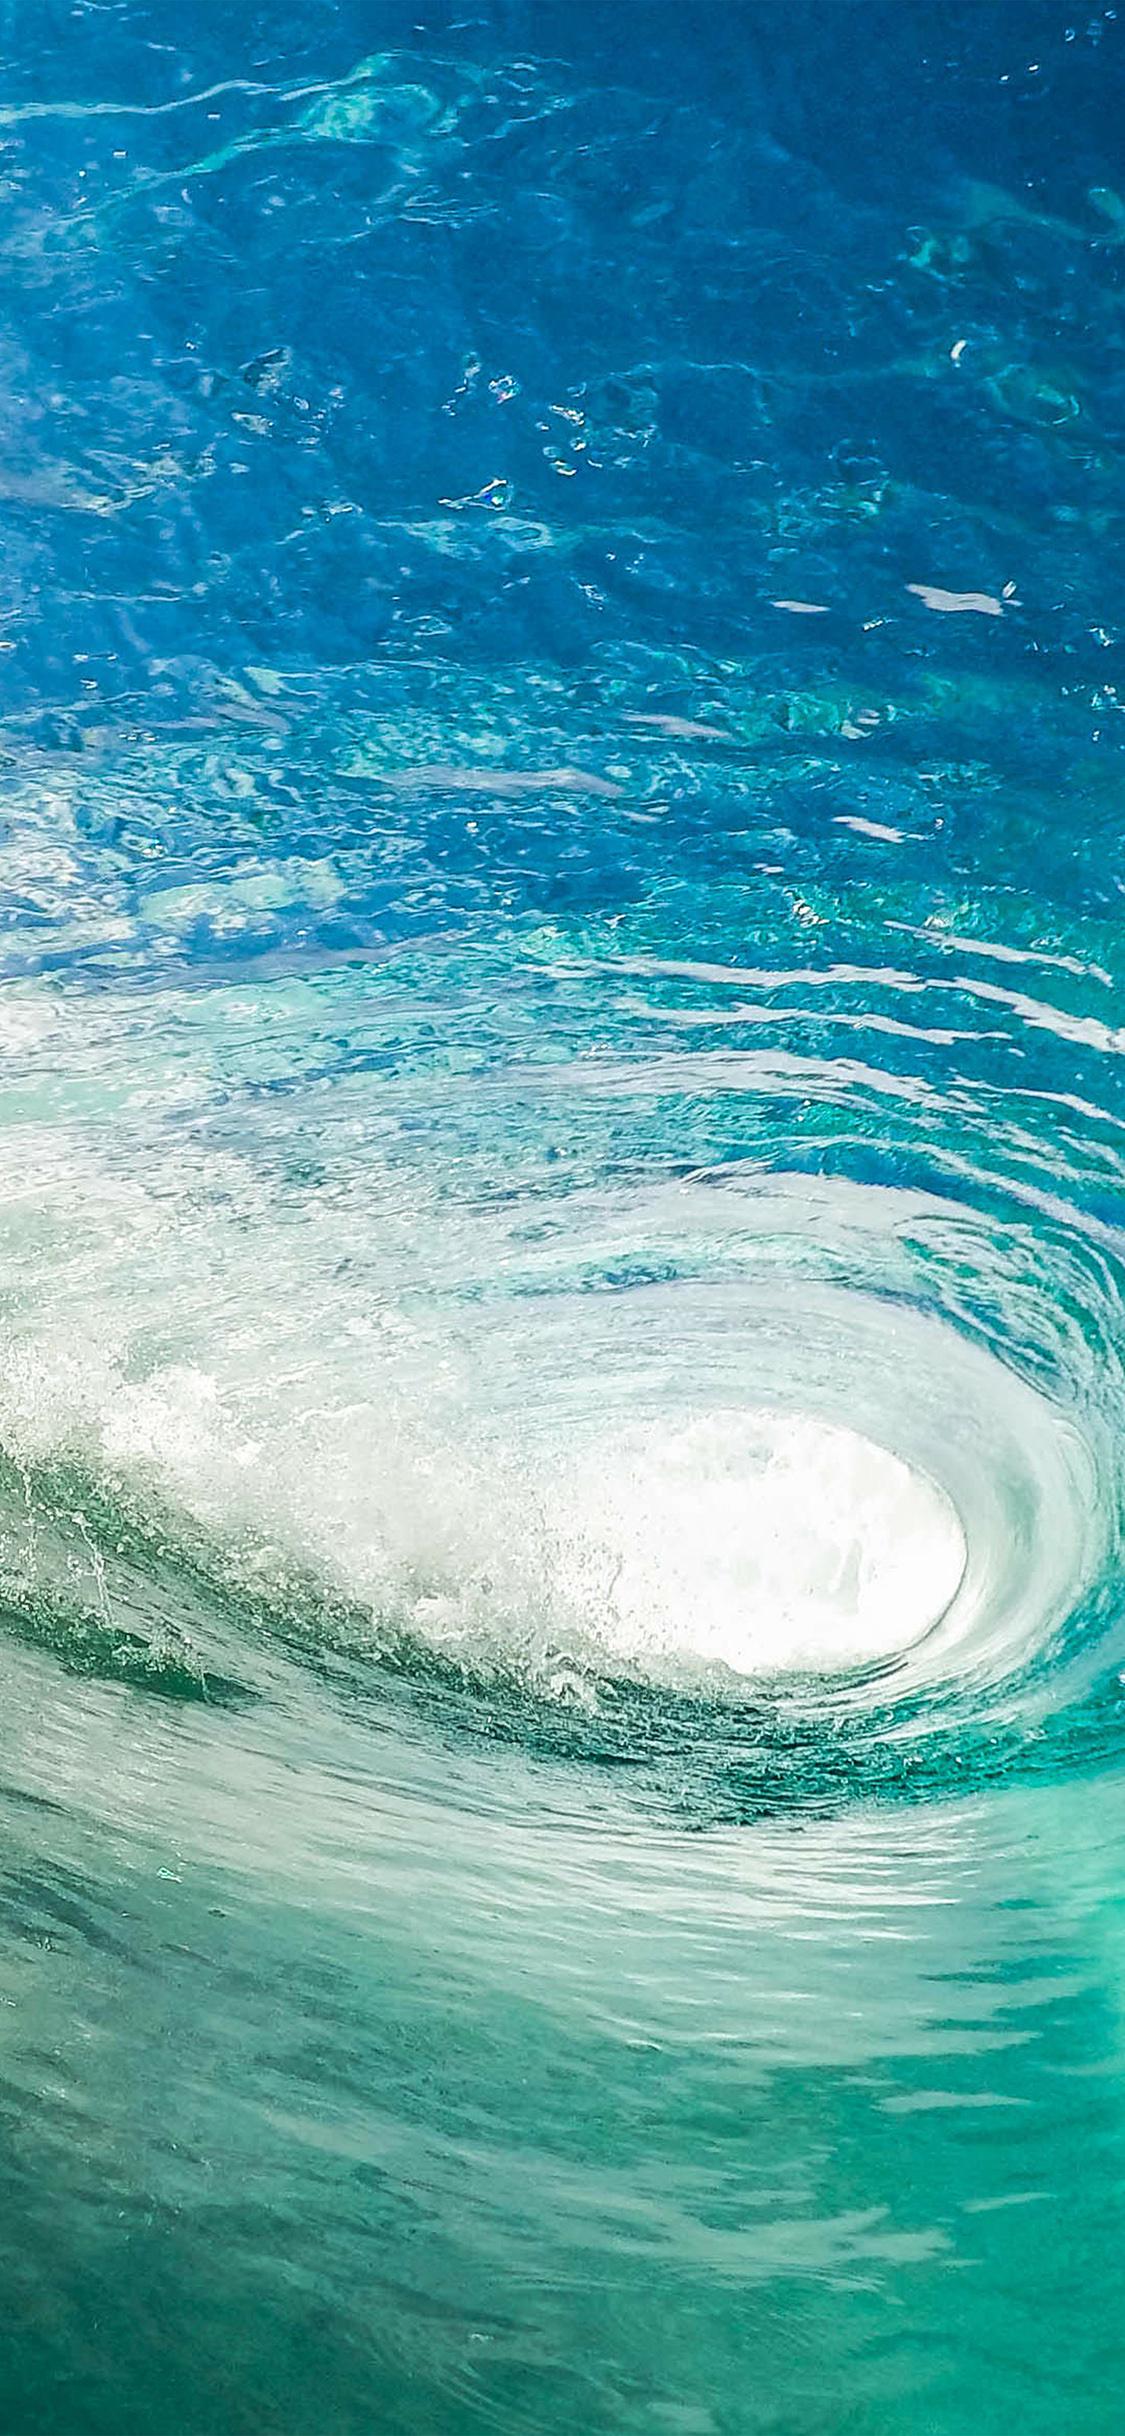 Iphonepapers Com Iphone 8 Wallpaper Nj05 Wave Cool Summer